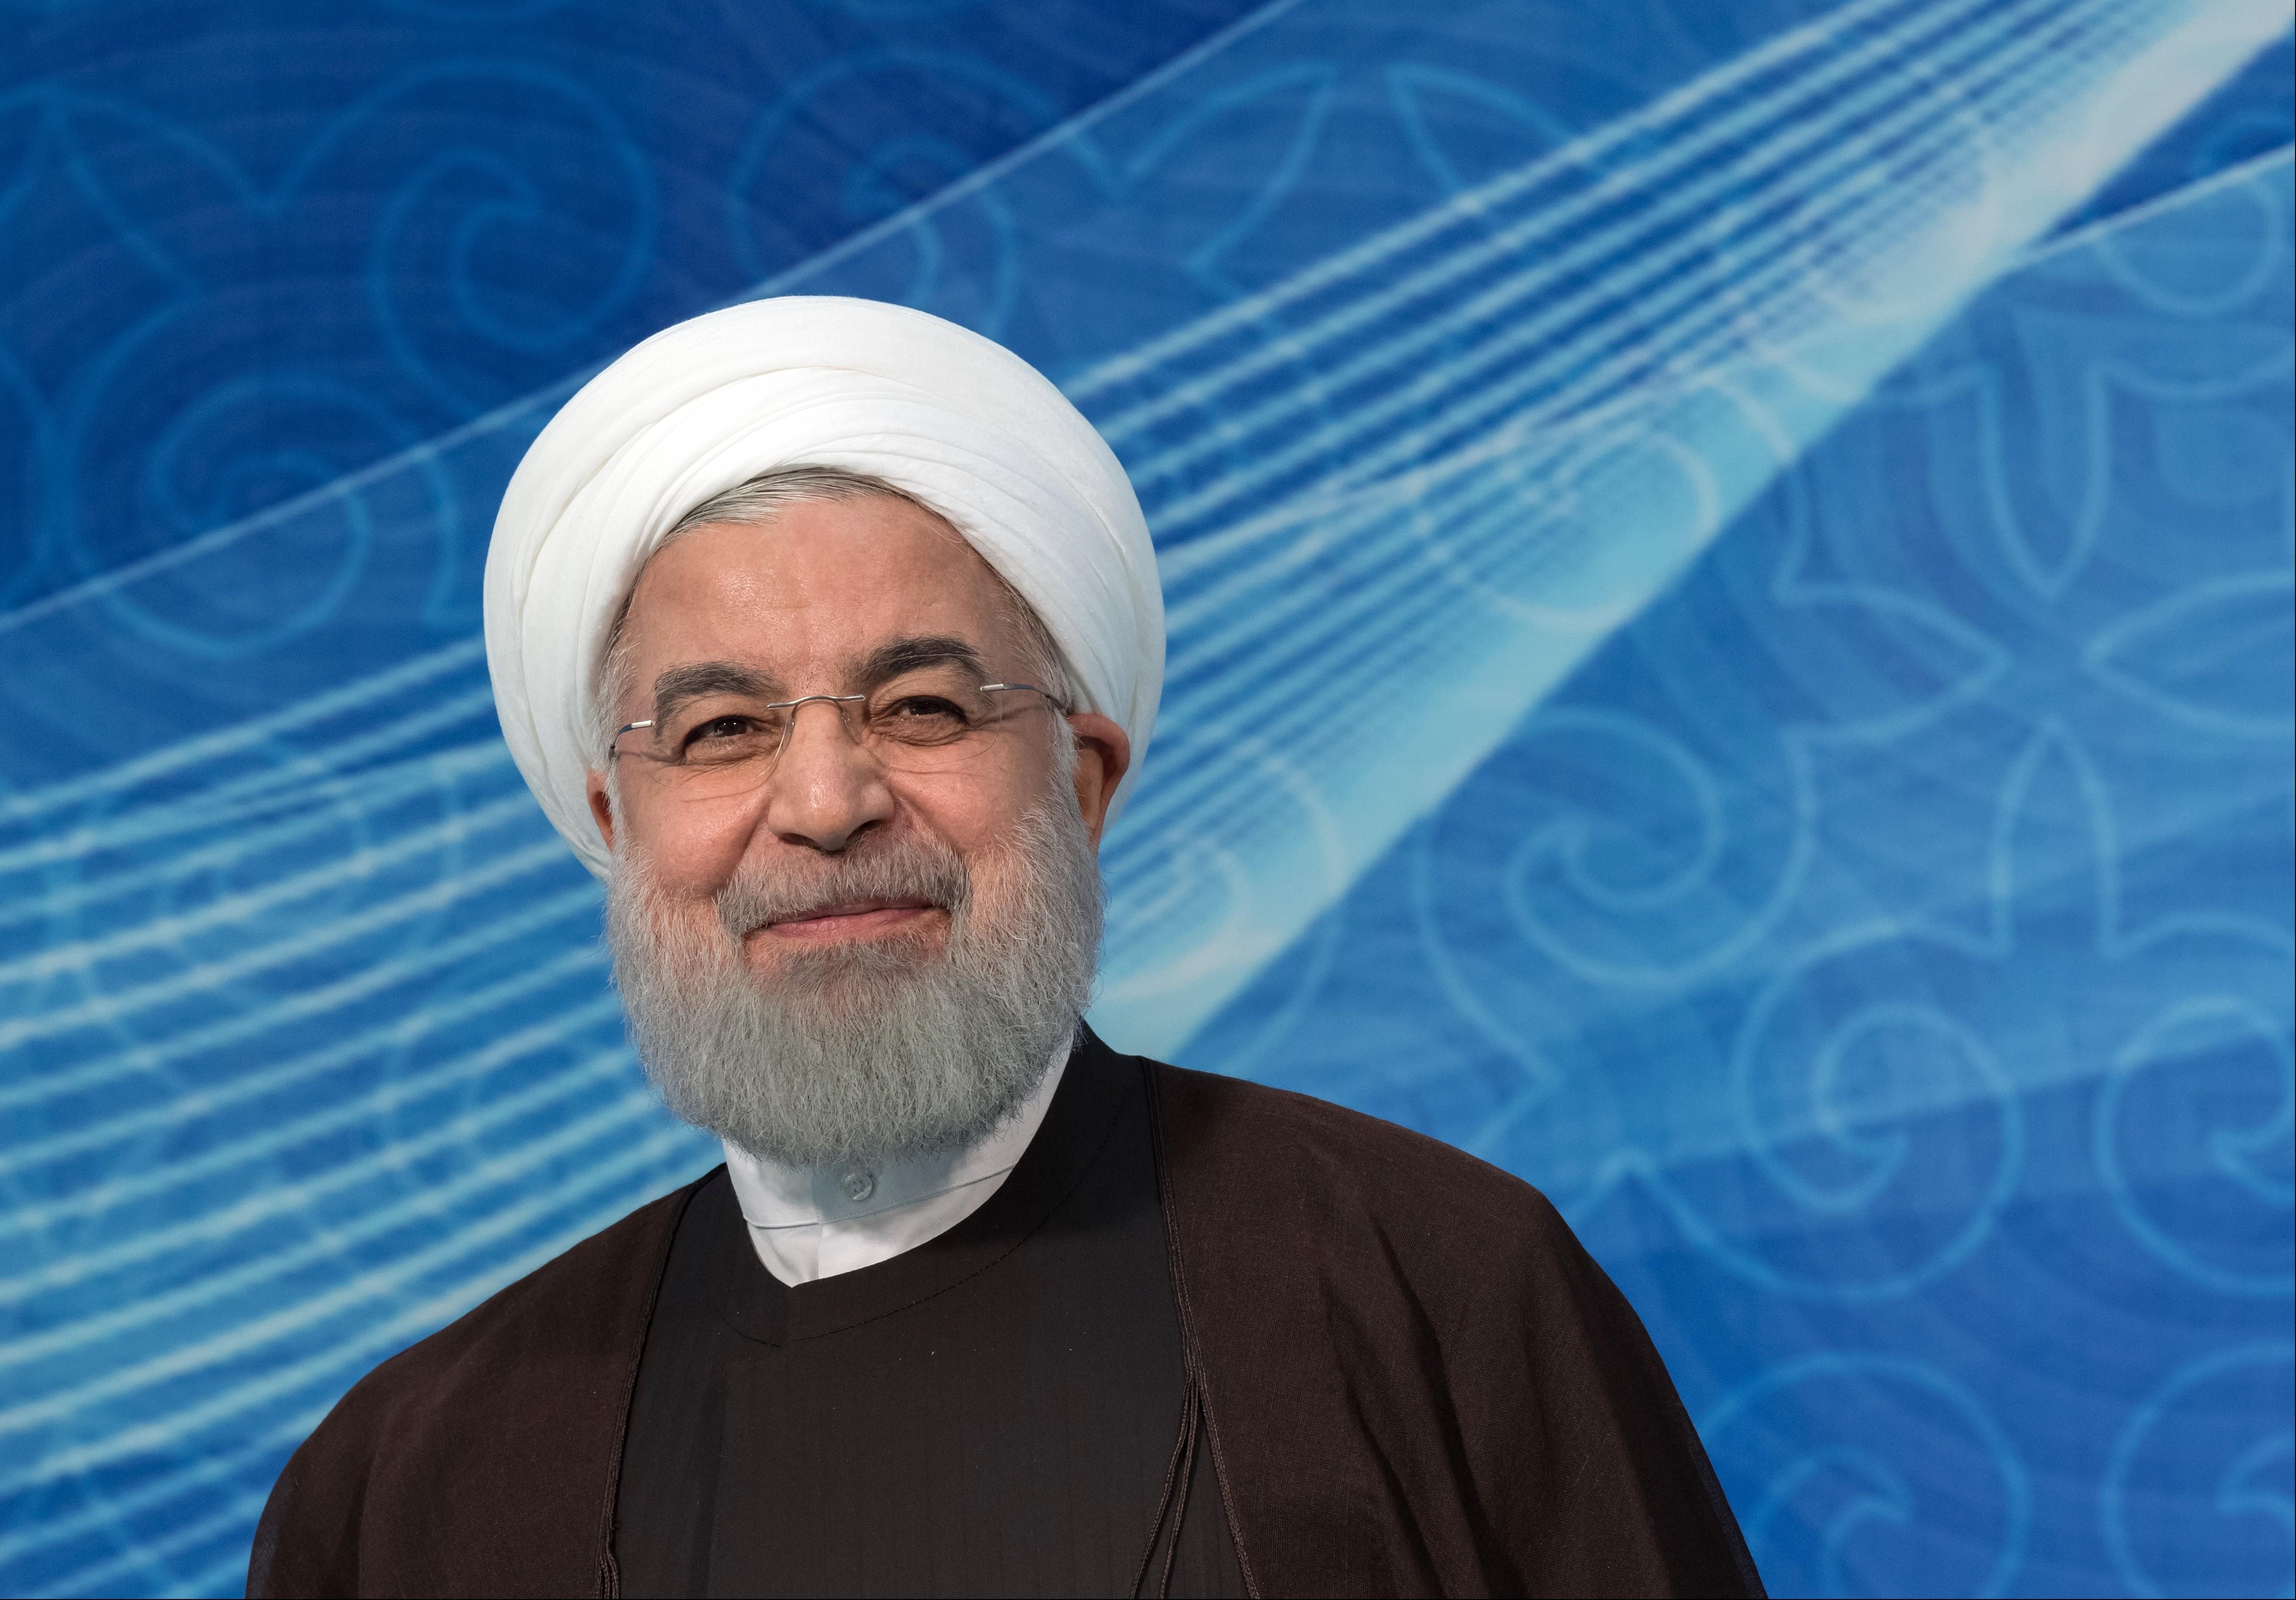 <p>Хасан Рухани. Фото: &copy;РИА Новости/Сергей Гунеев</p>